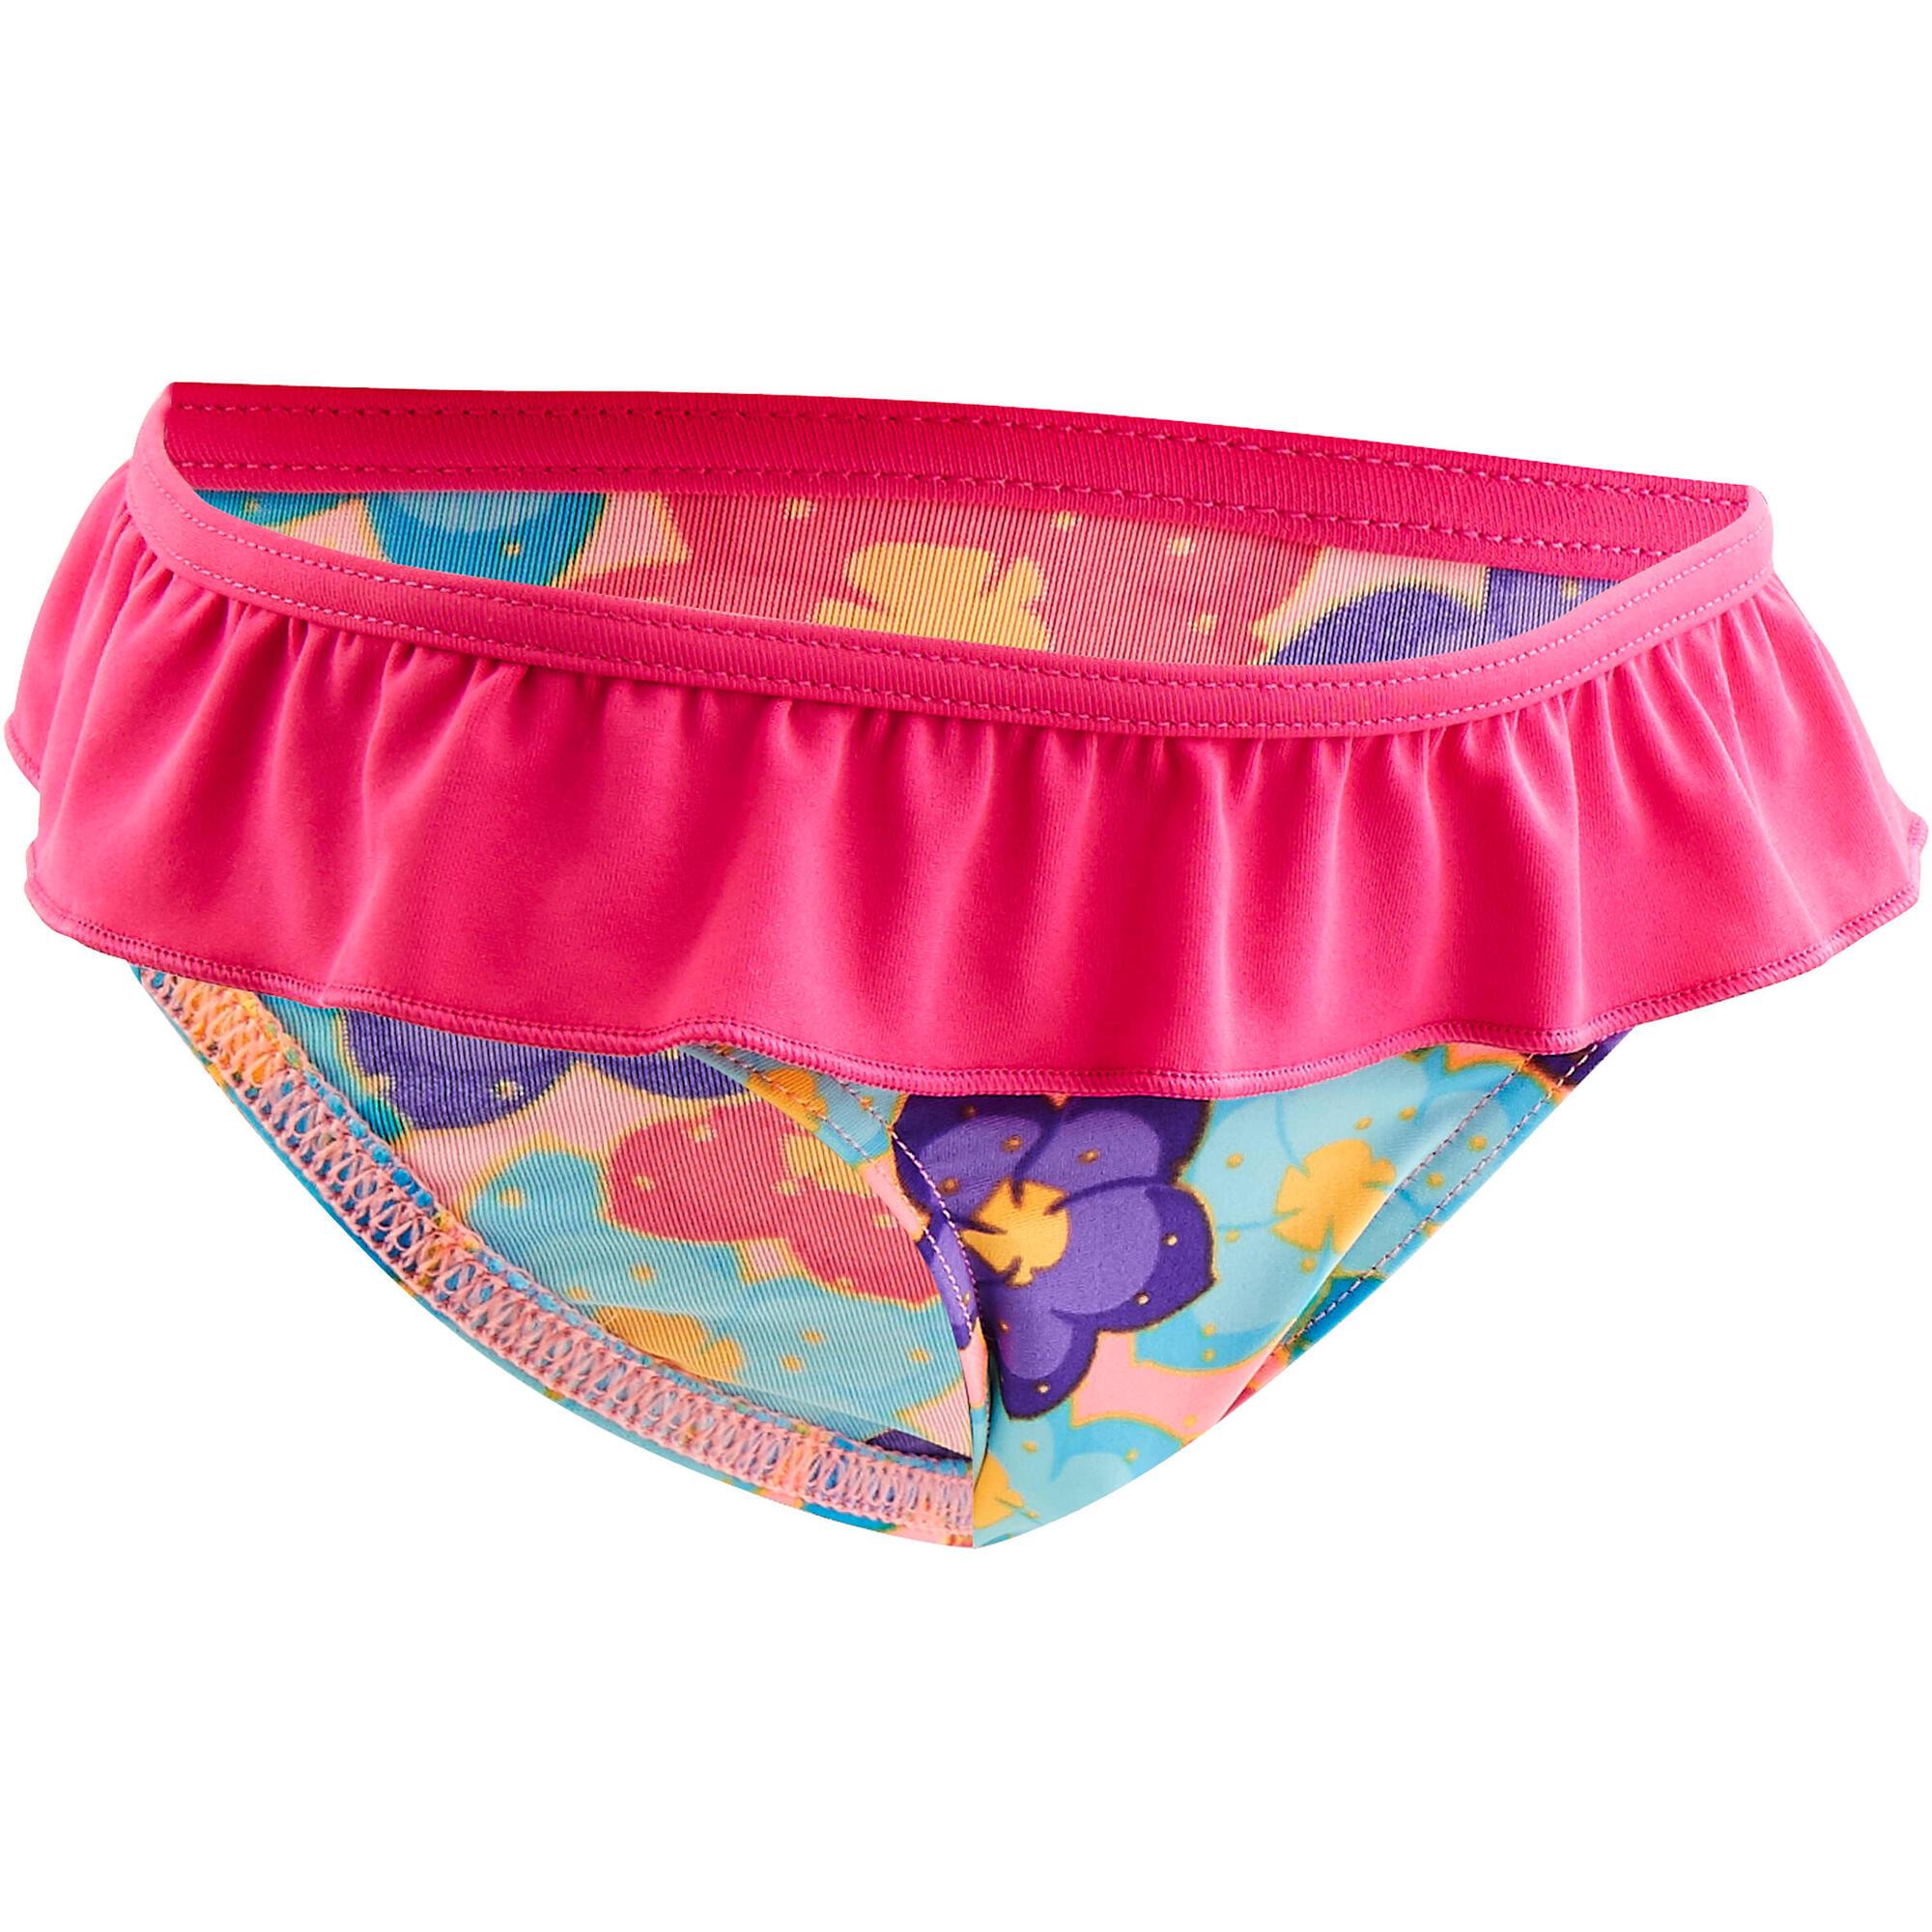 maillot de bain une pi ce culotte b b fille imprim fleurs nabaiji. Black Bedroom Furniture Sets. Home Design Ideas